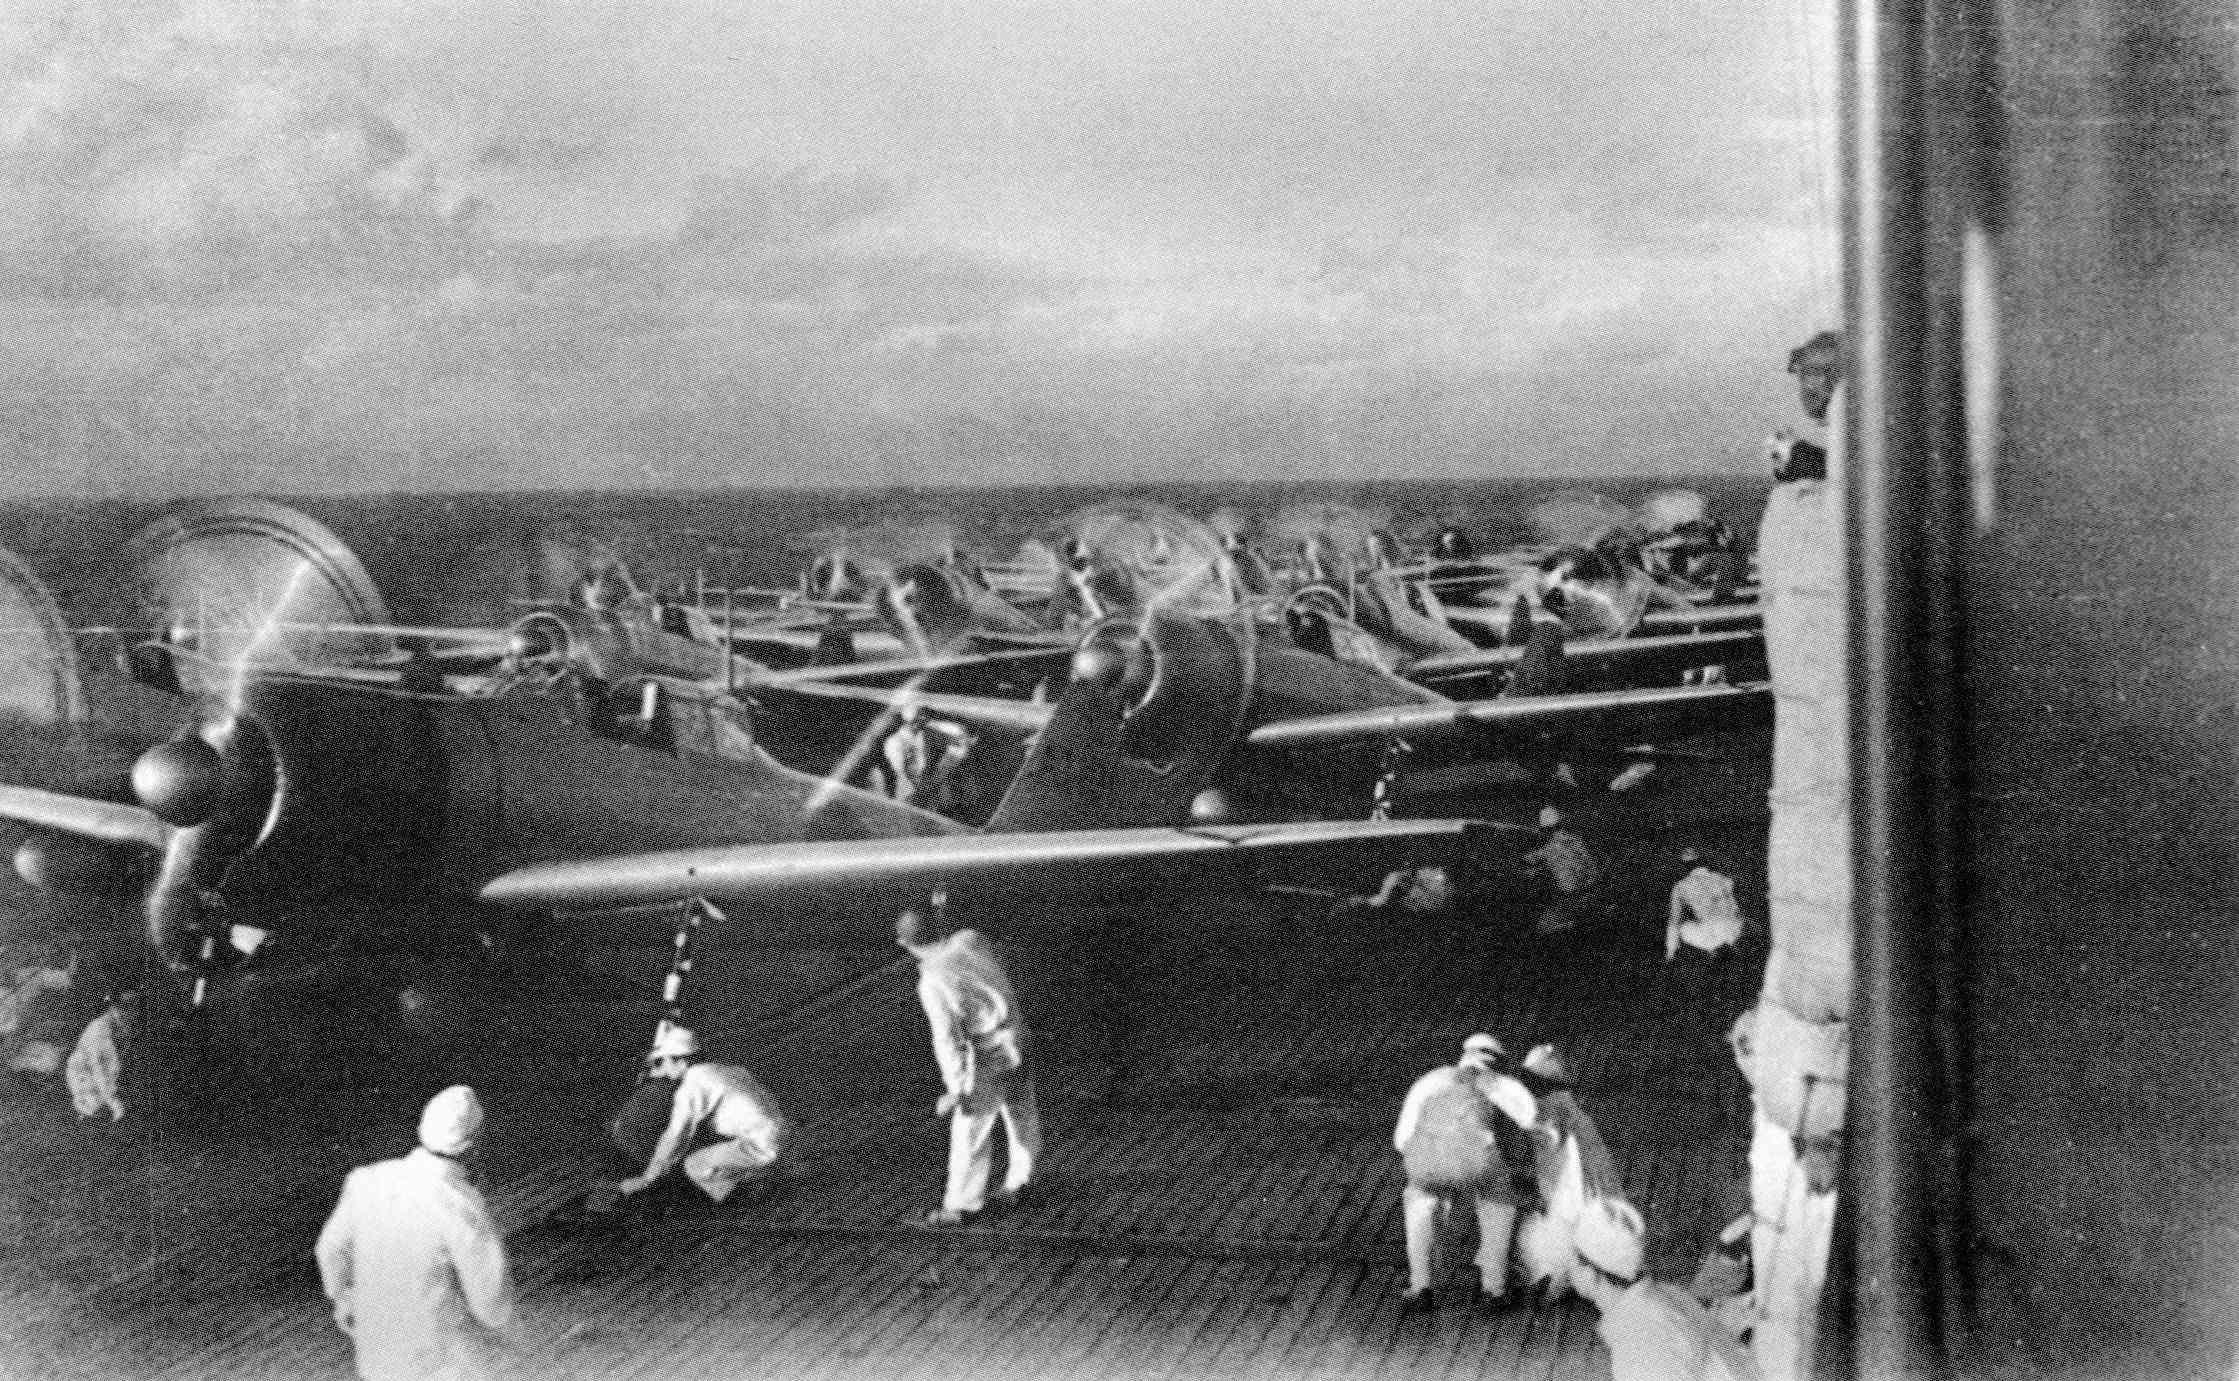 Propeller aircraft preparing to take off from Akagi, 1941.